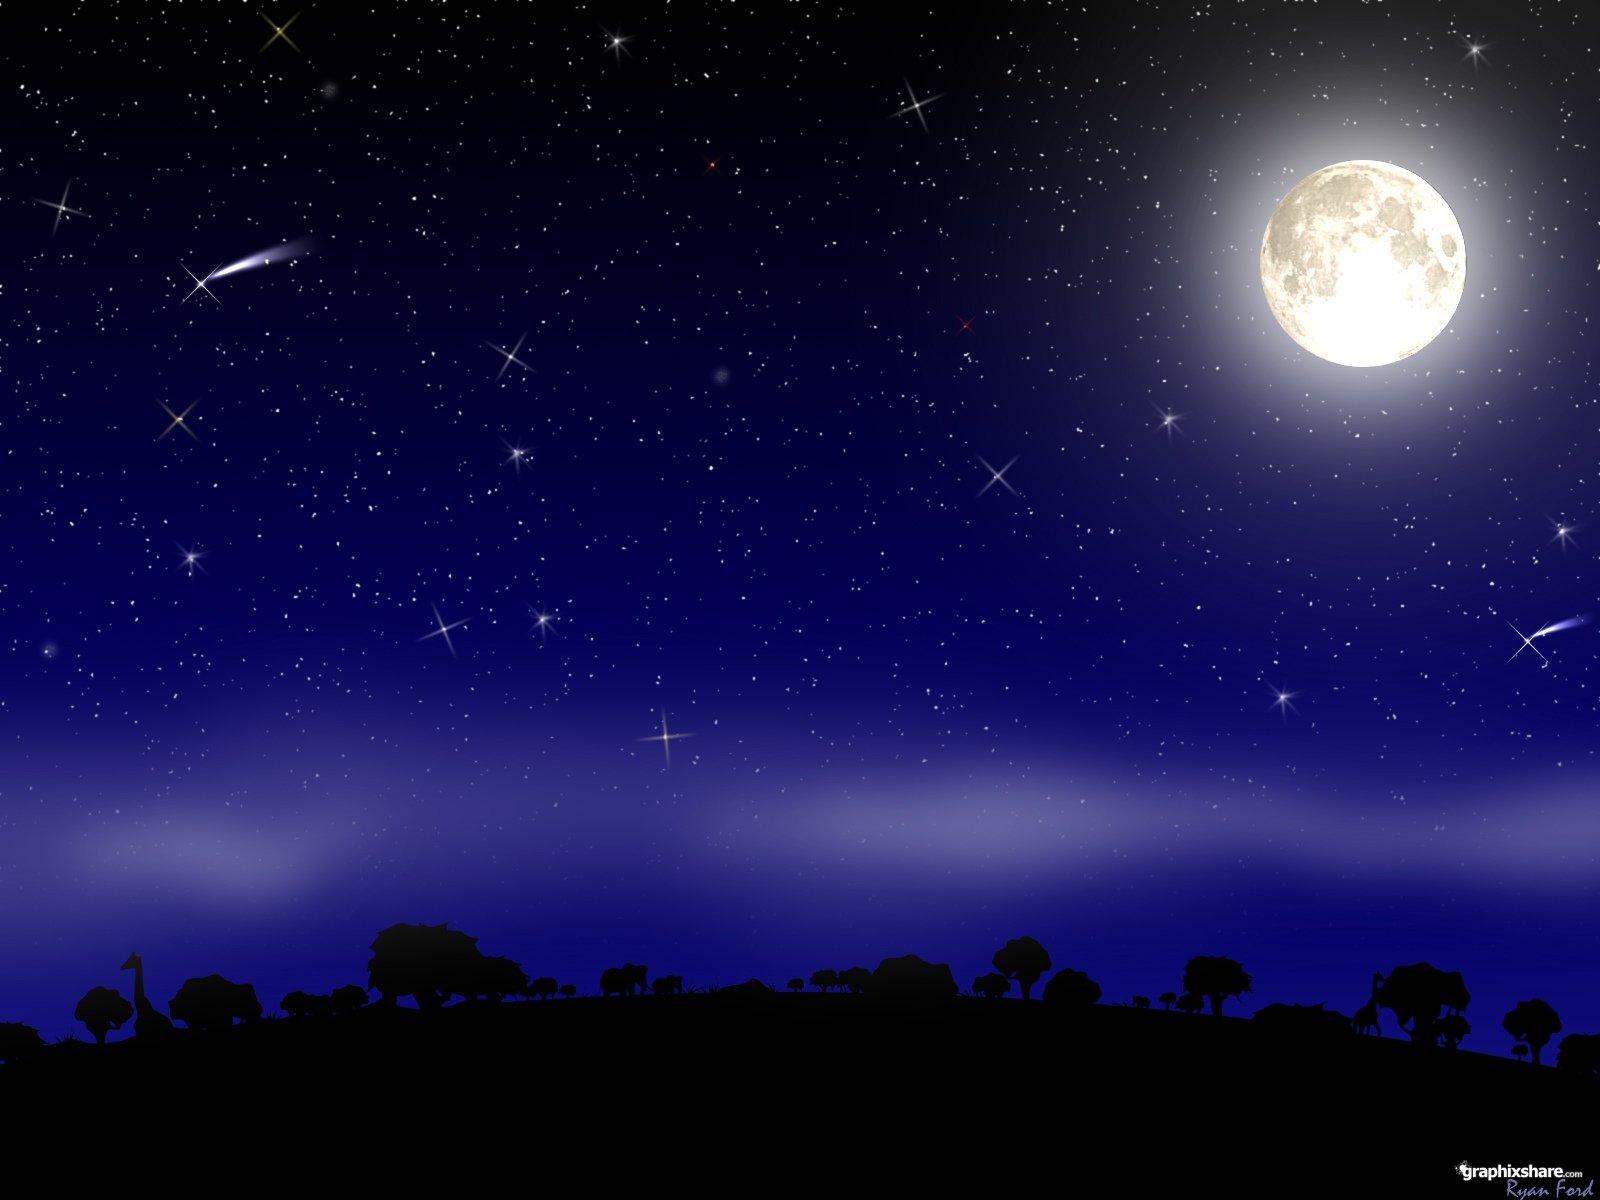 night sky stars wallpaper night sky stars wallpaper night sky stars 1600x1200